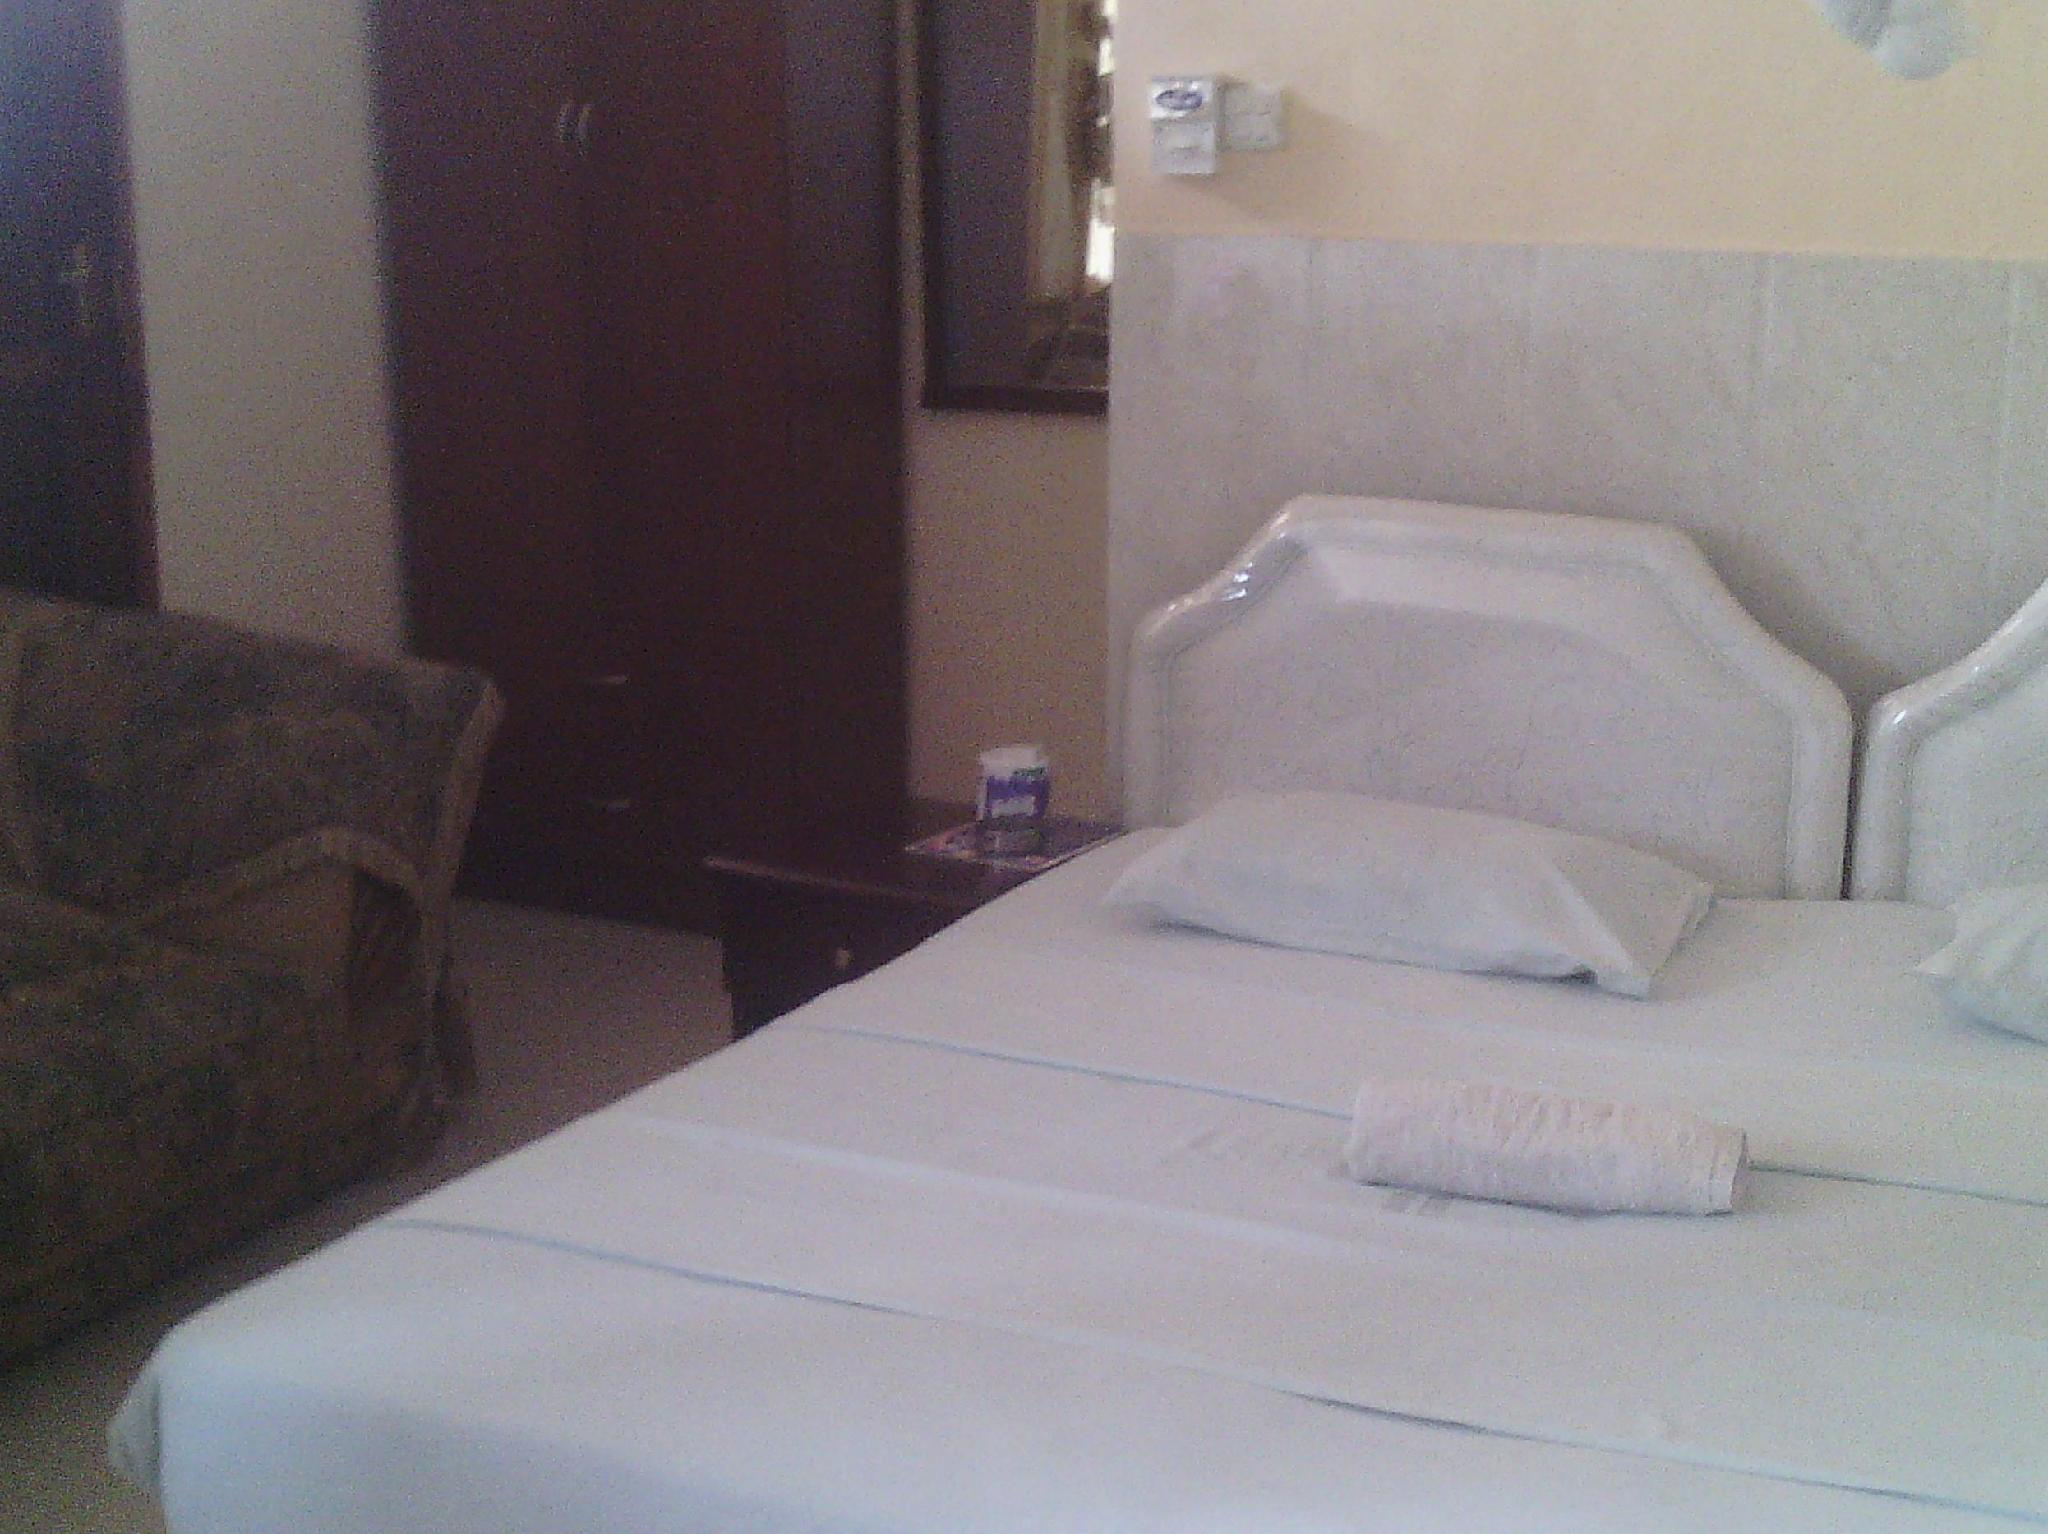 Cross Way Executive Hotel Ltd